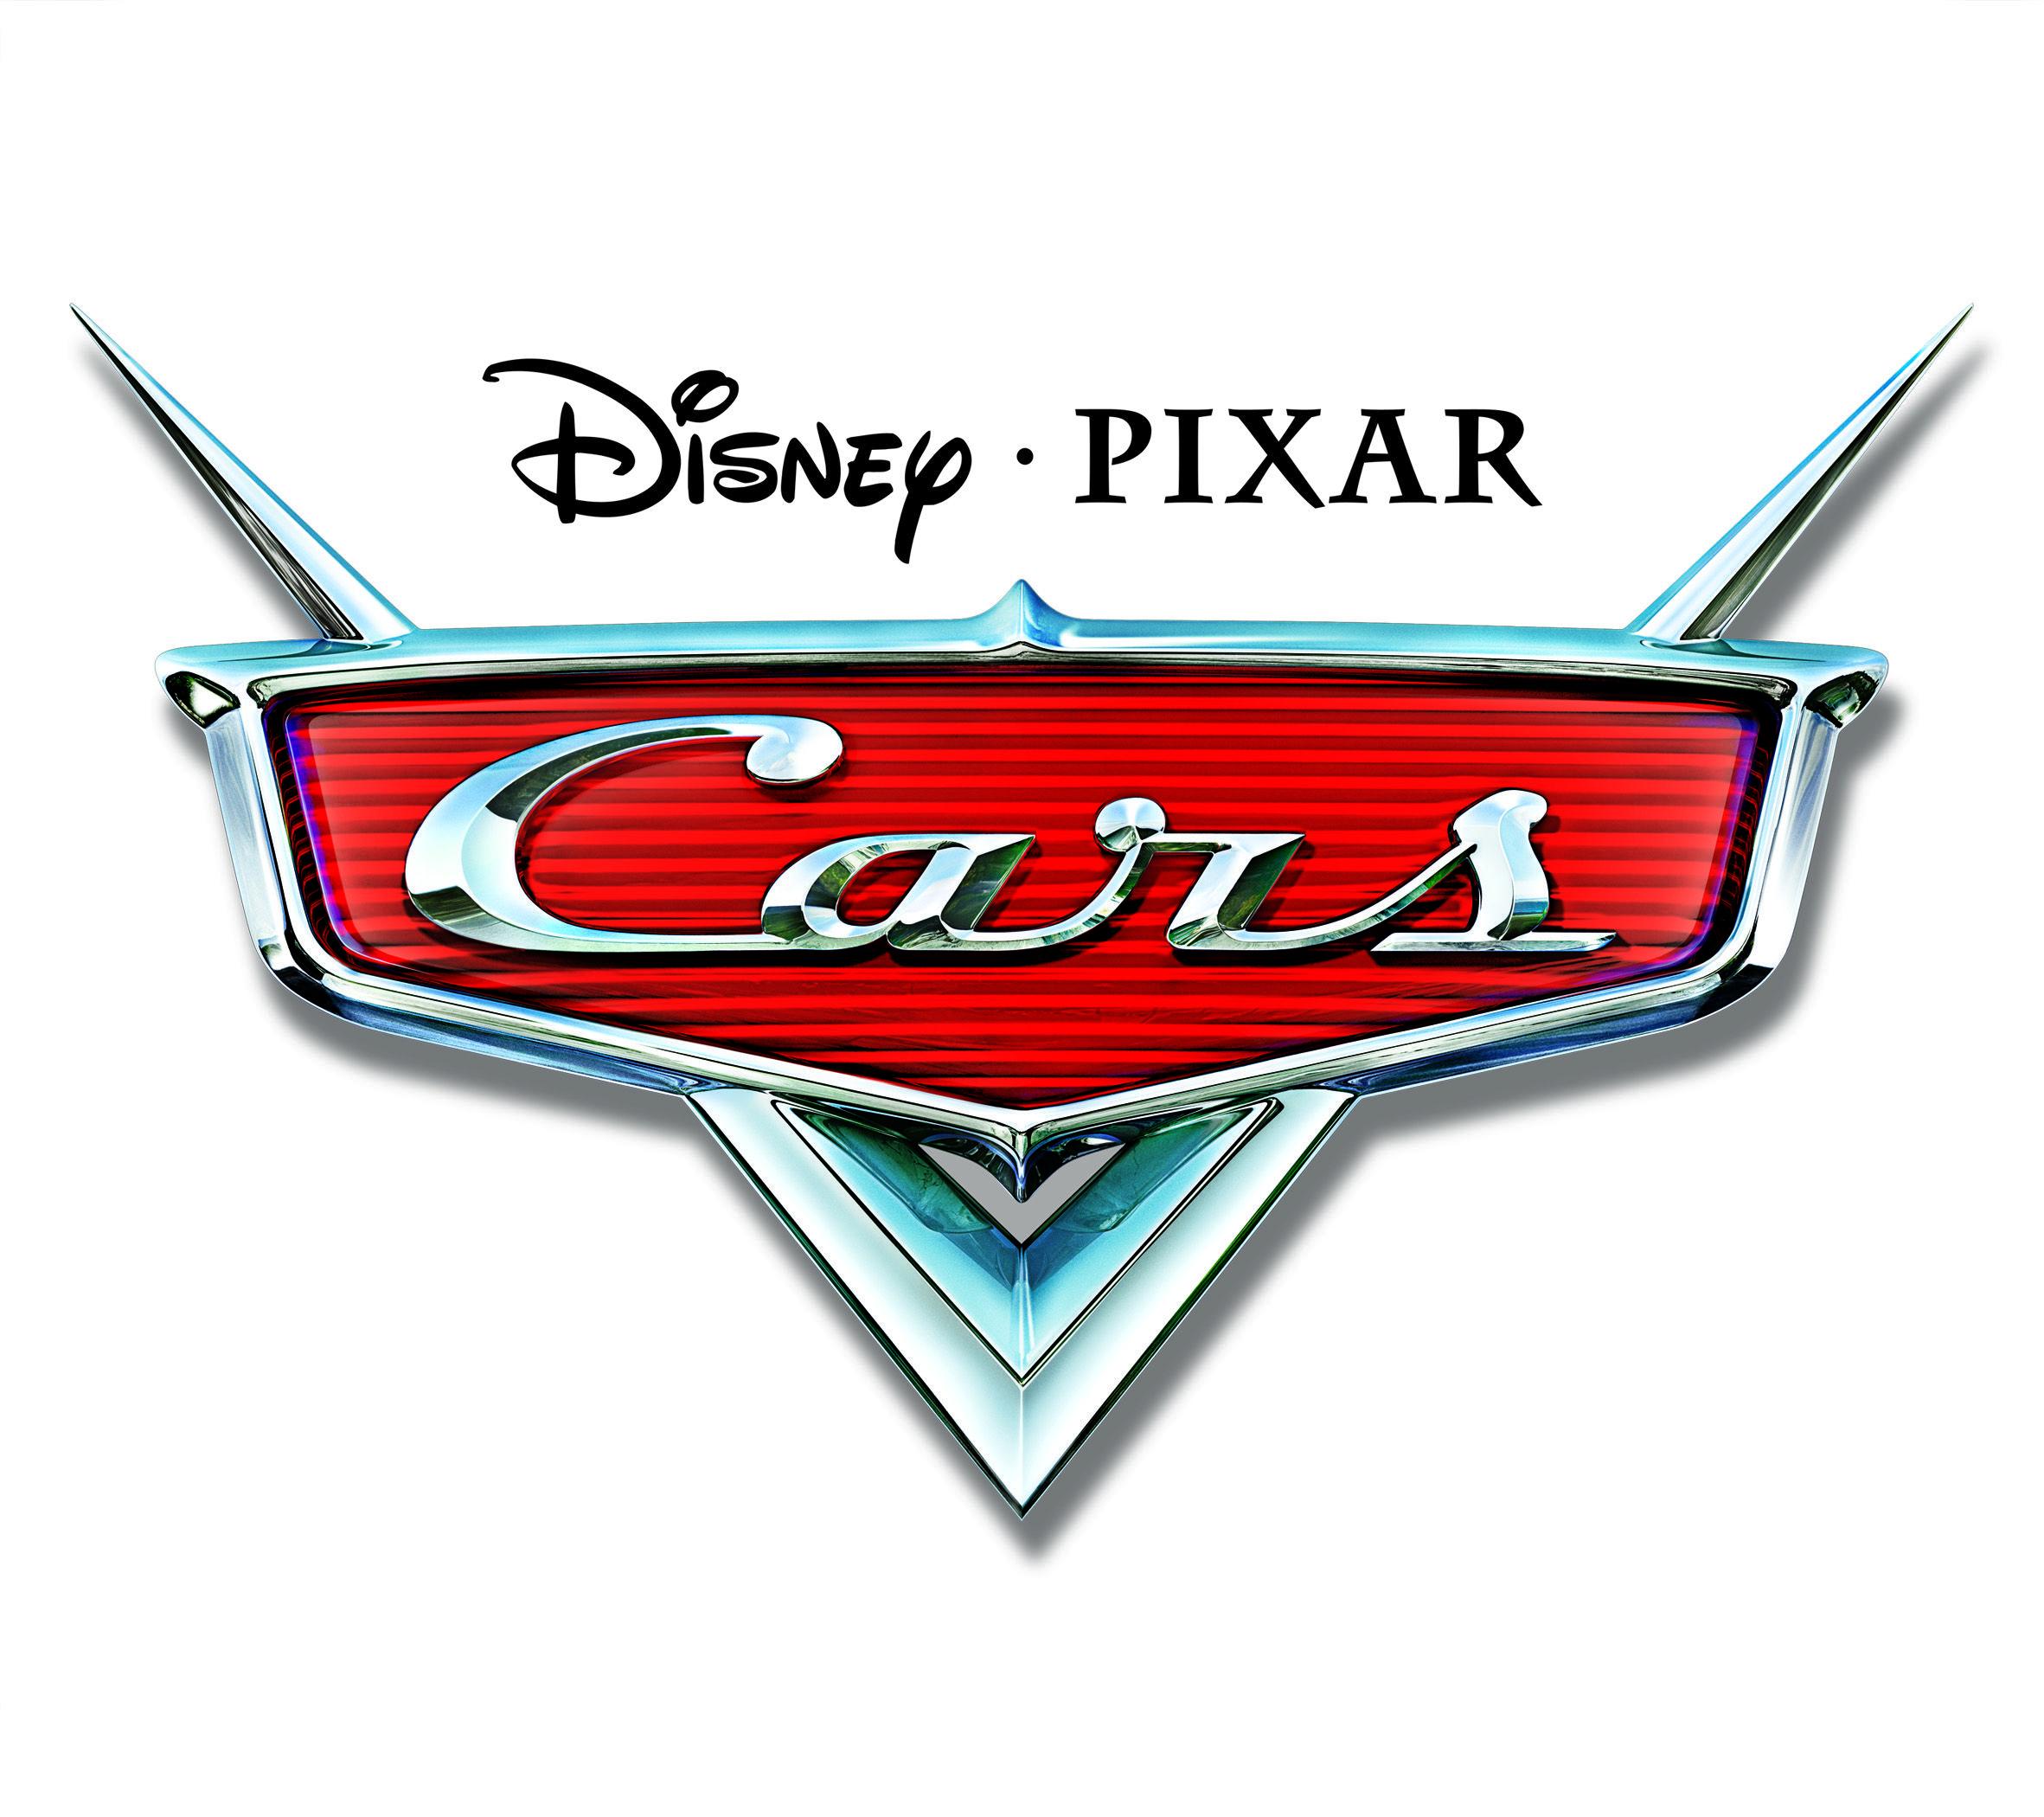 Disney Pixar Cars | Disney's Wonderland + Pixar World ...